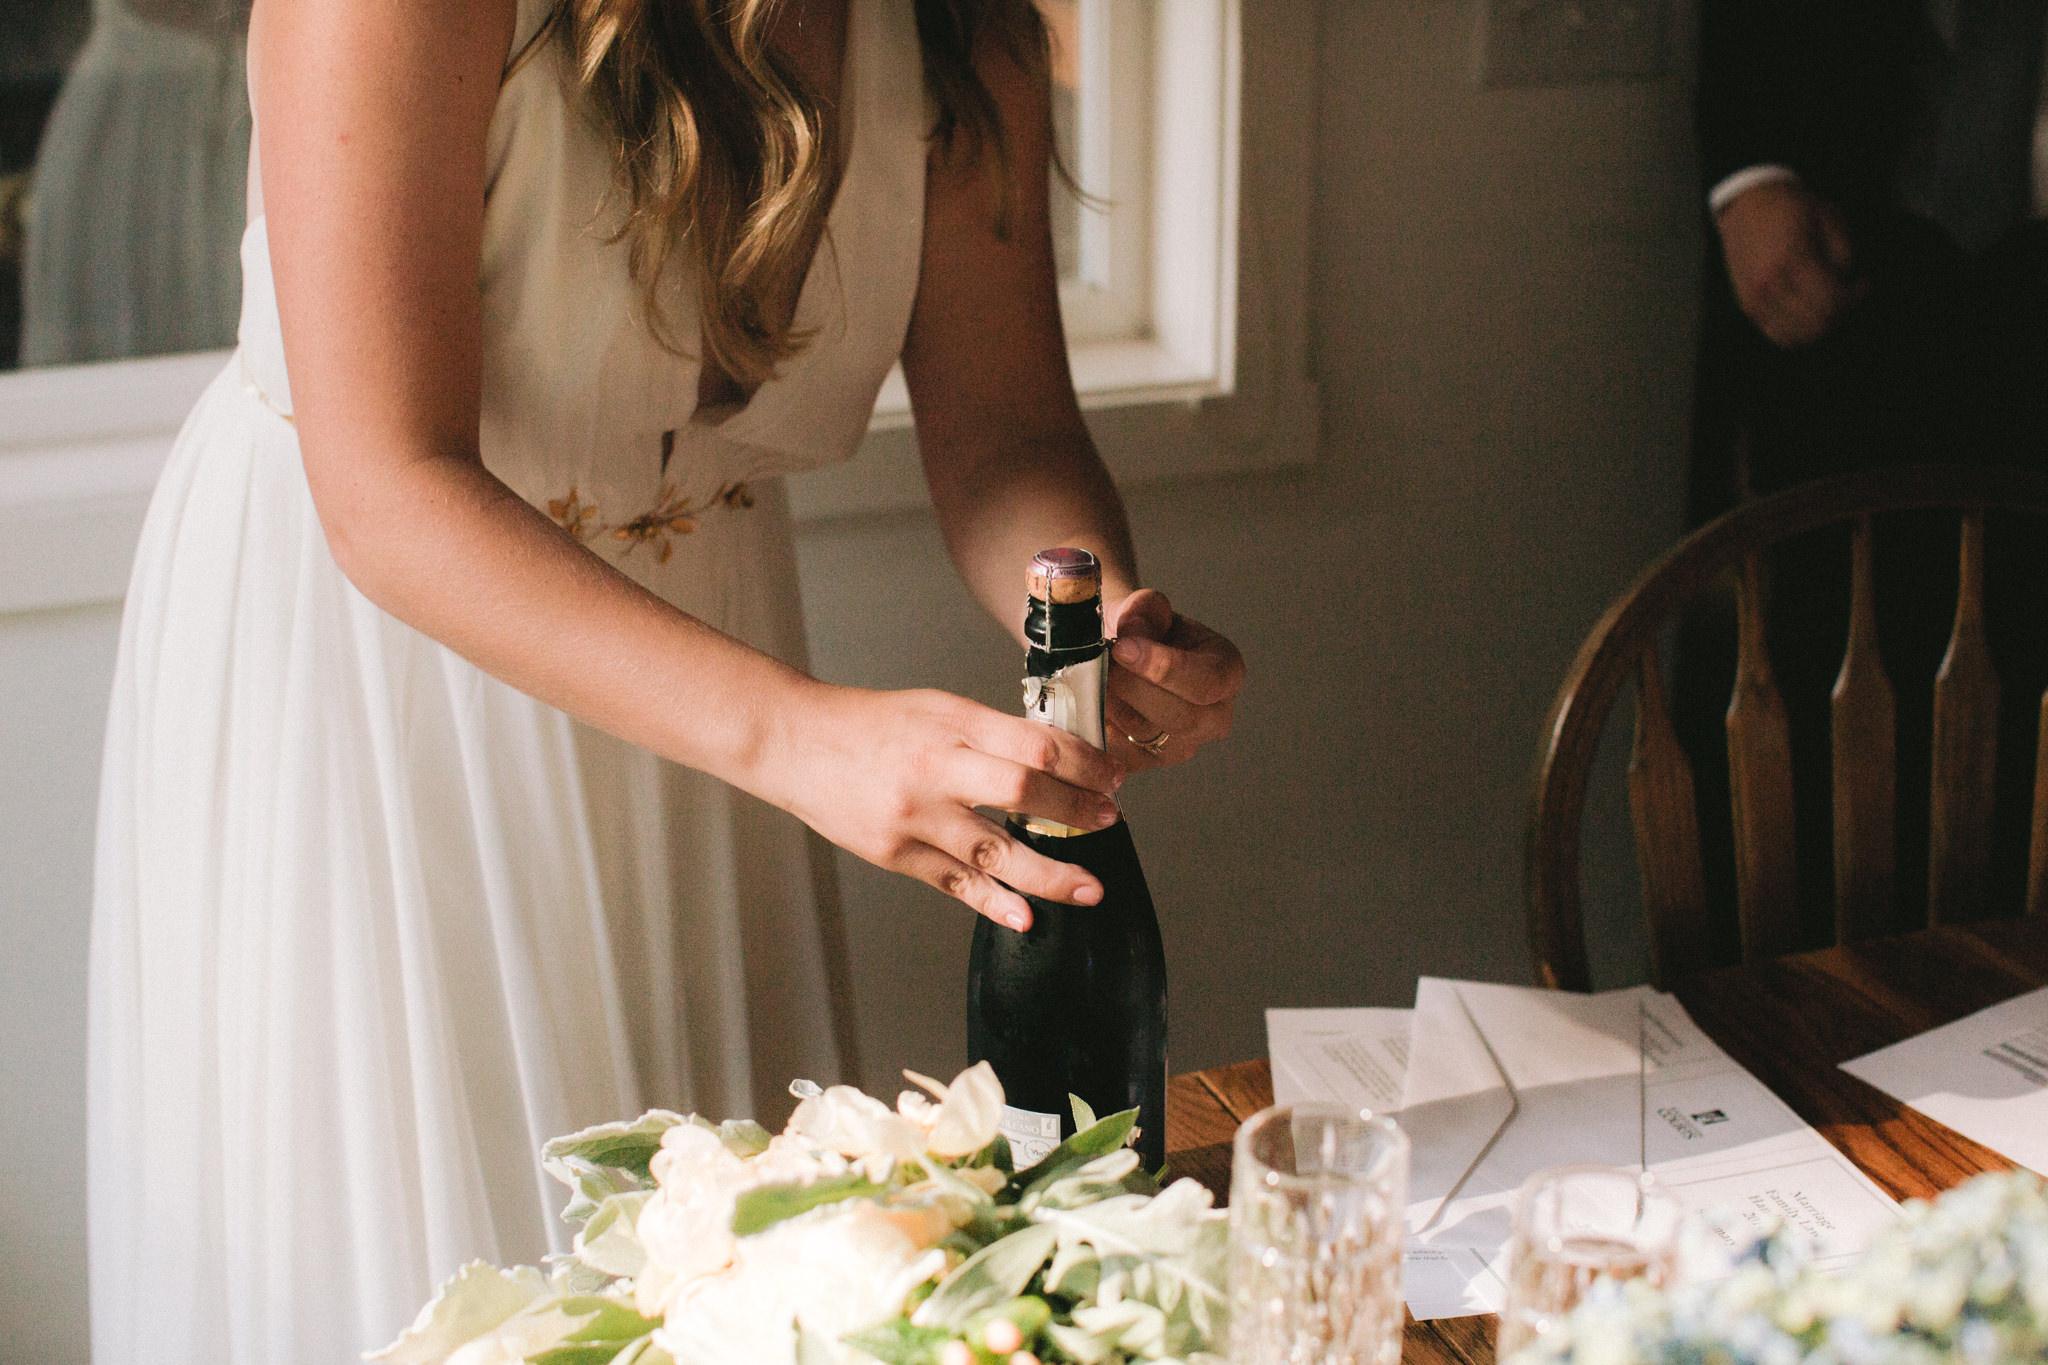 Backyard-Bainbridge-Island-Wedding-Alycia-Lovell-Photography-127.JPG